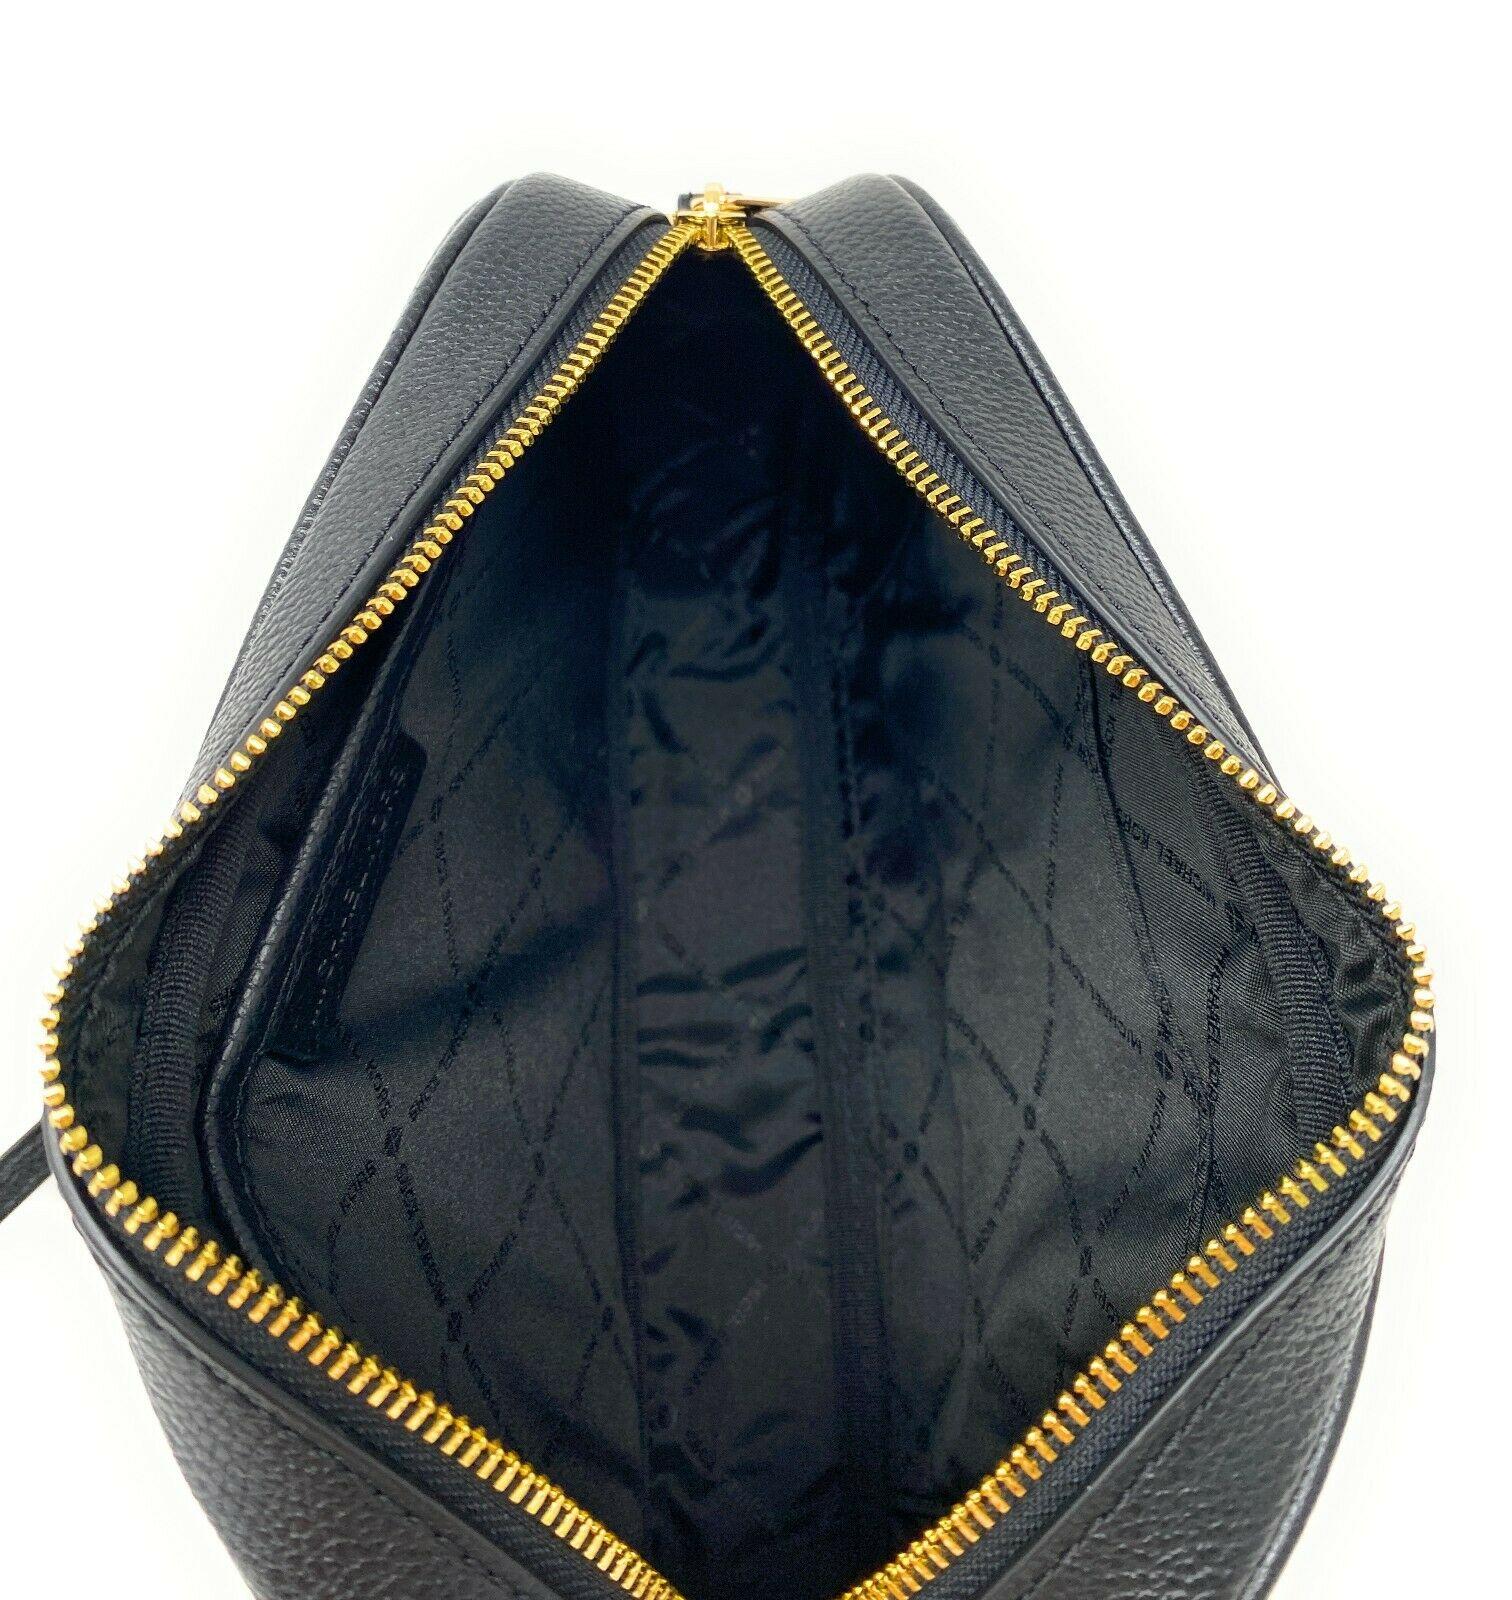 thumbnail 97 - Michael Kors Jet Set Item Large East West Crossbody Chain Handbag Clutch $298